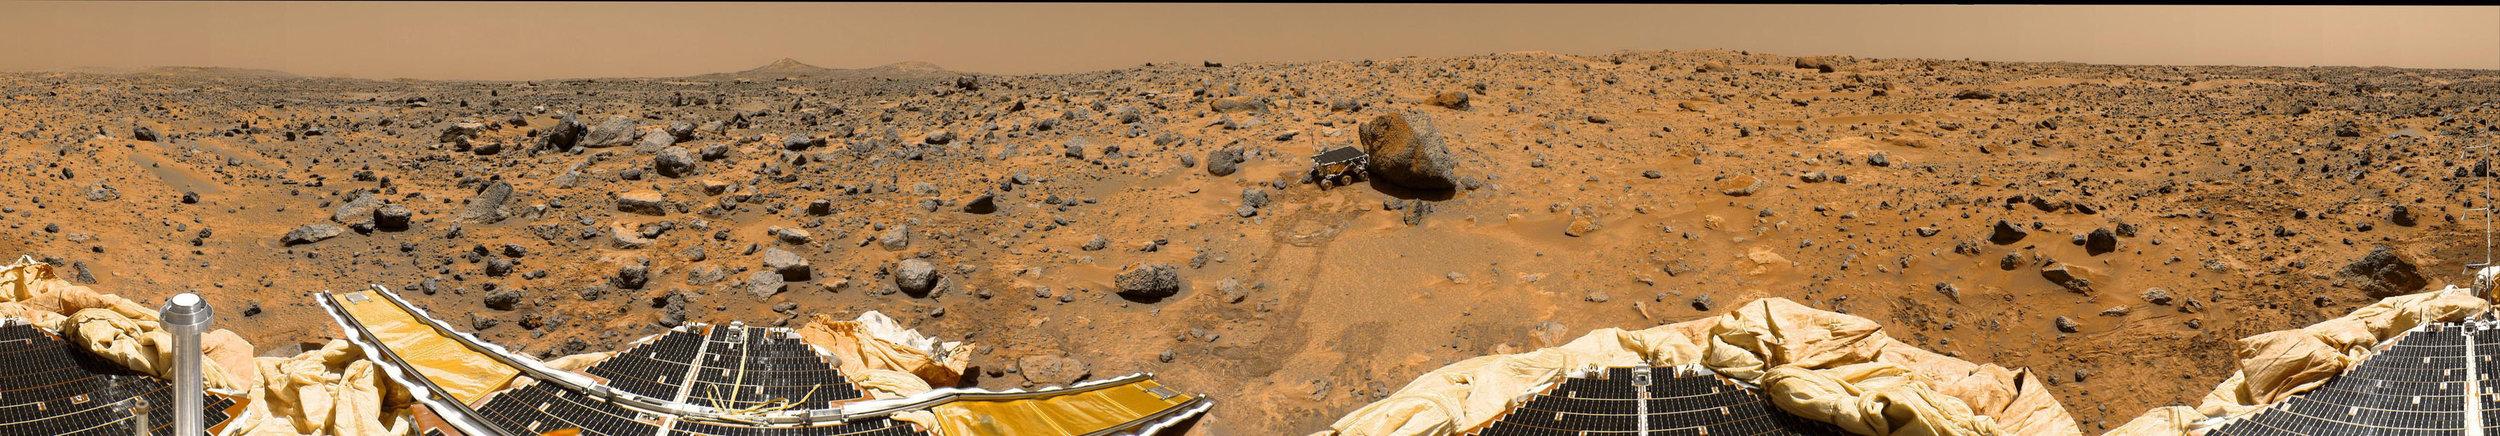 A panorama of Mars